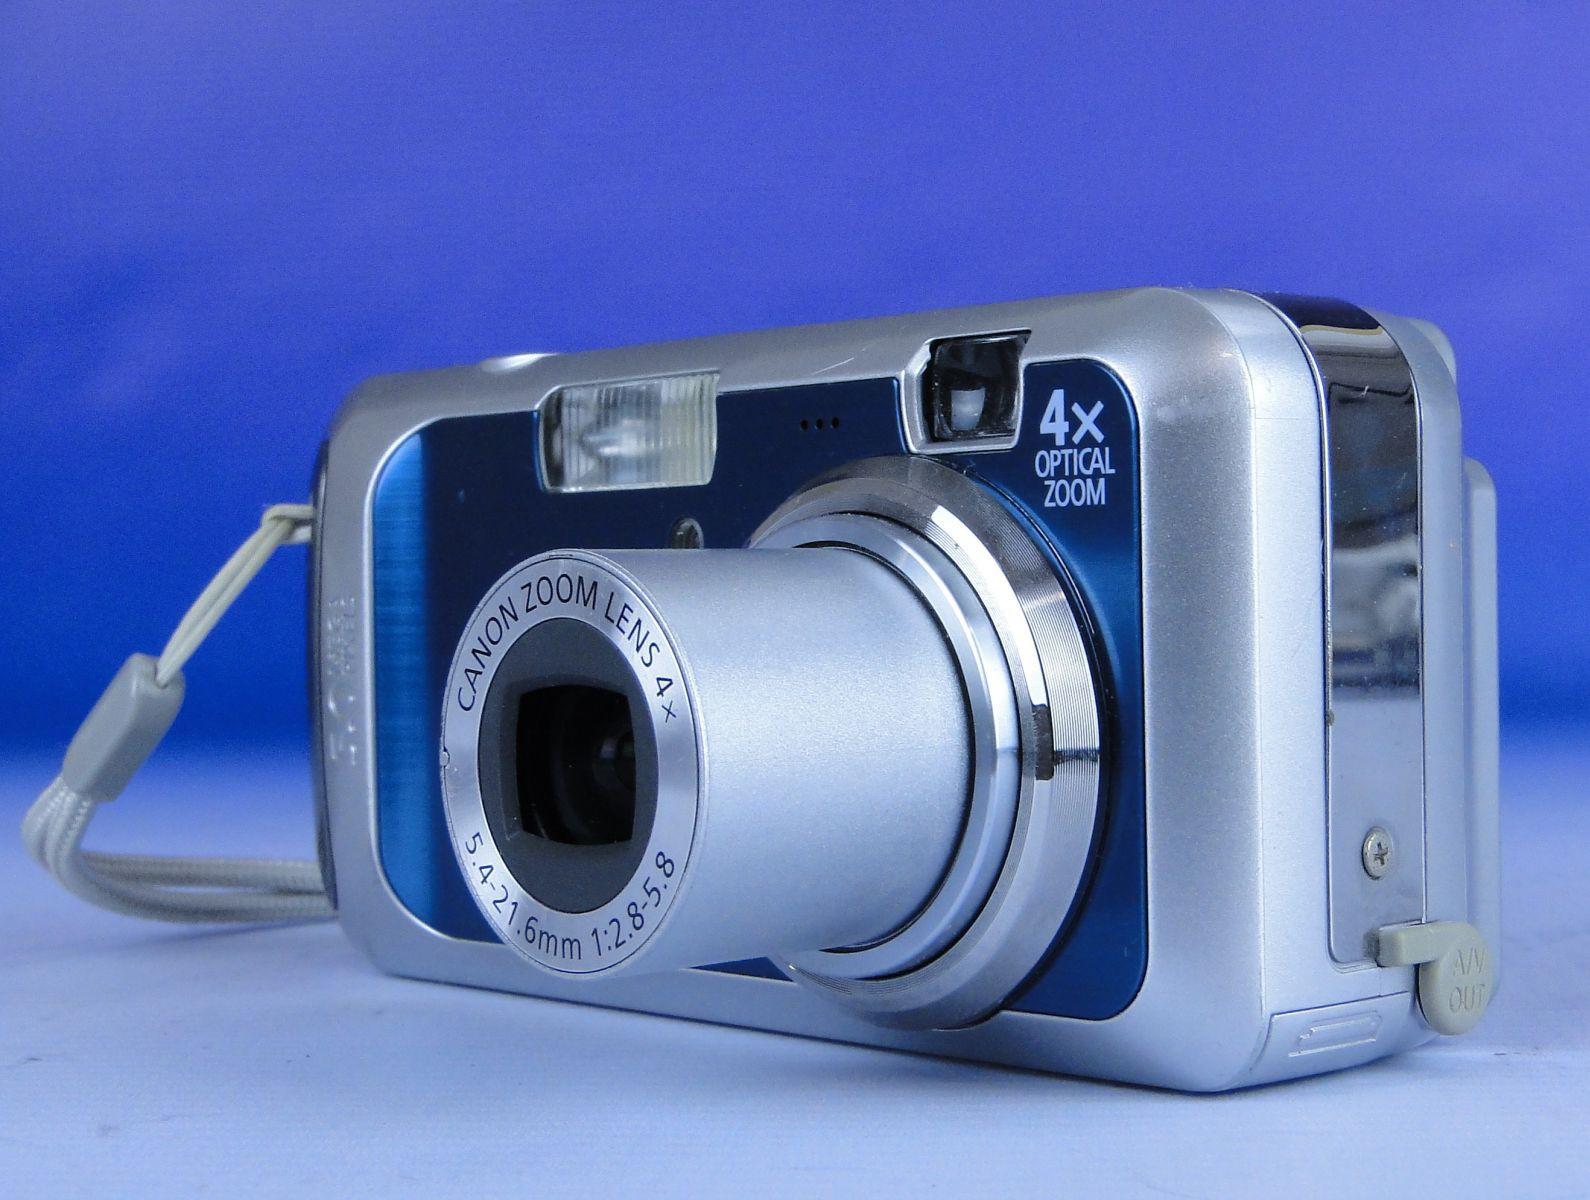 DSC03643.JPG (1590×1200)